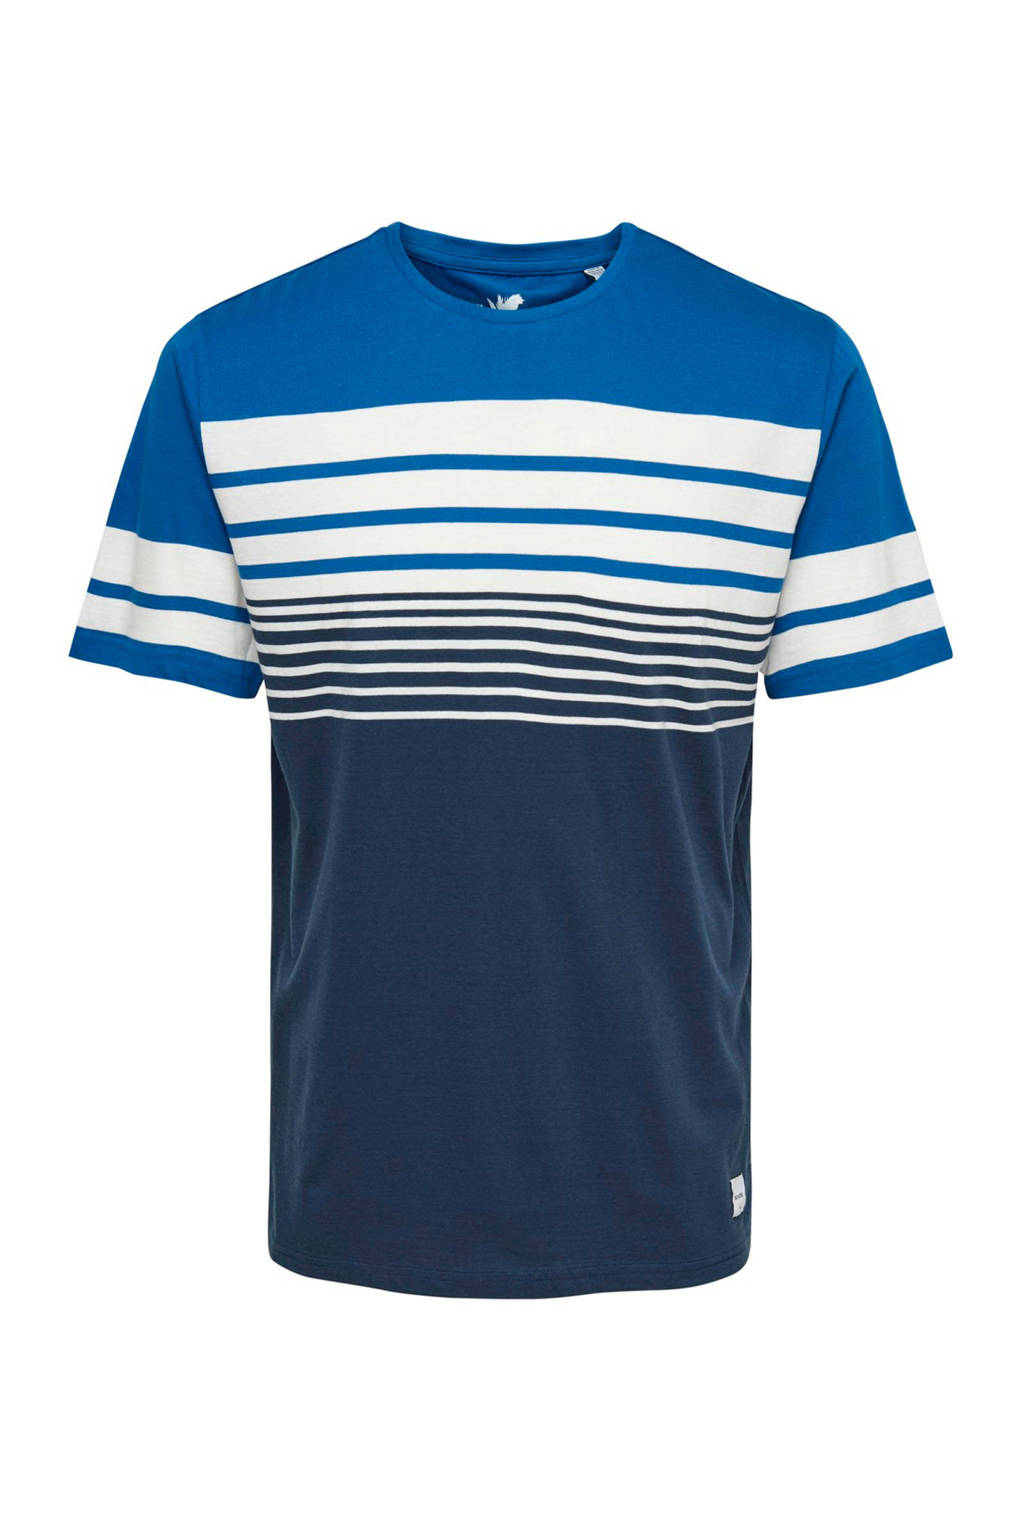 Only & Sons T-shirt met strepen blauw, Blauw